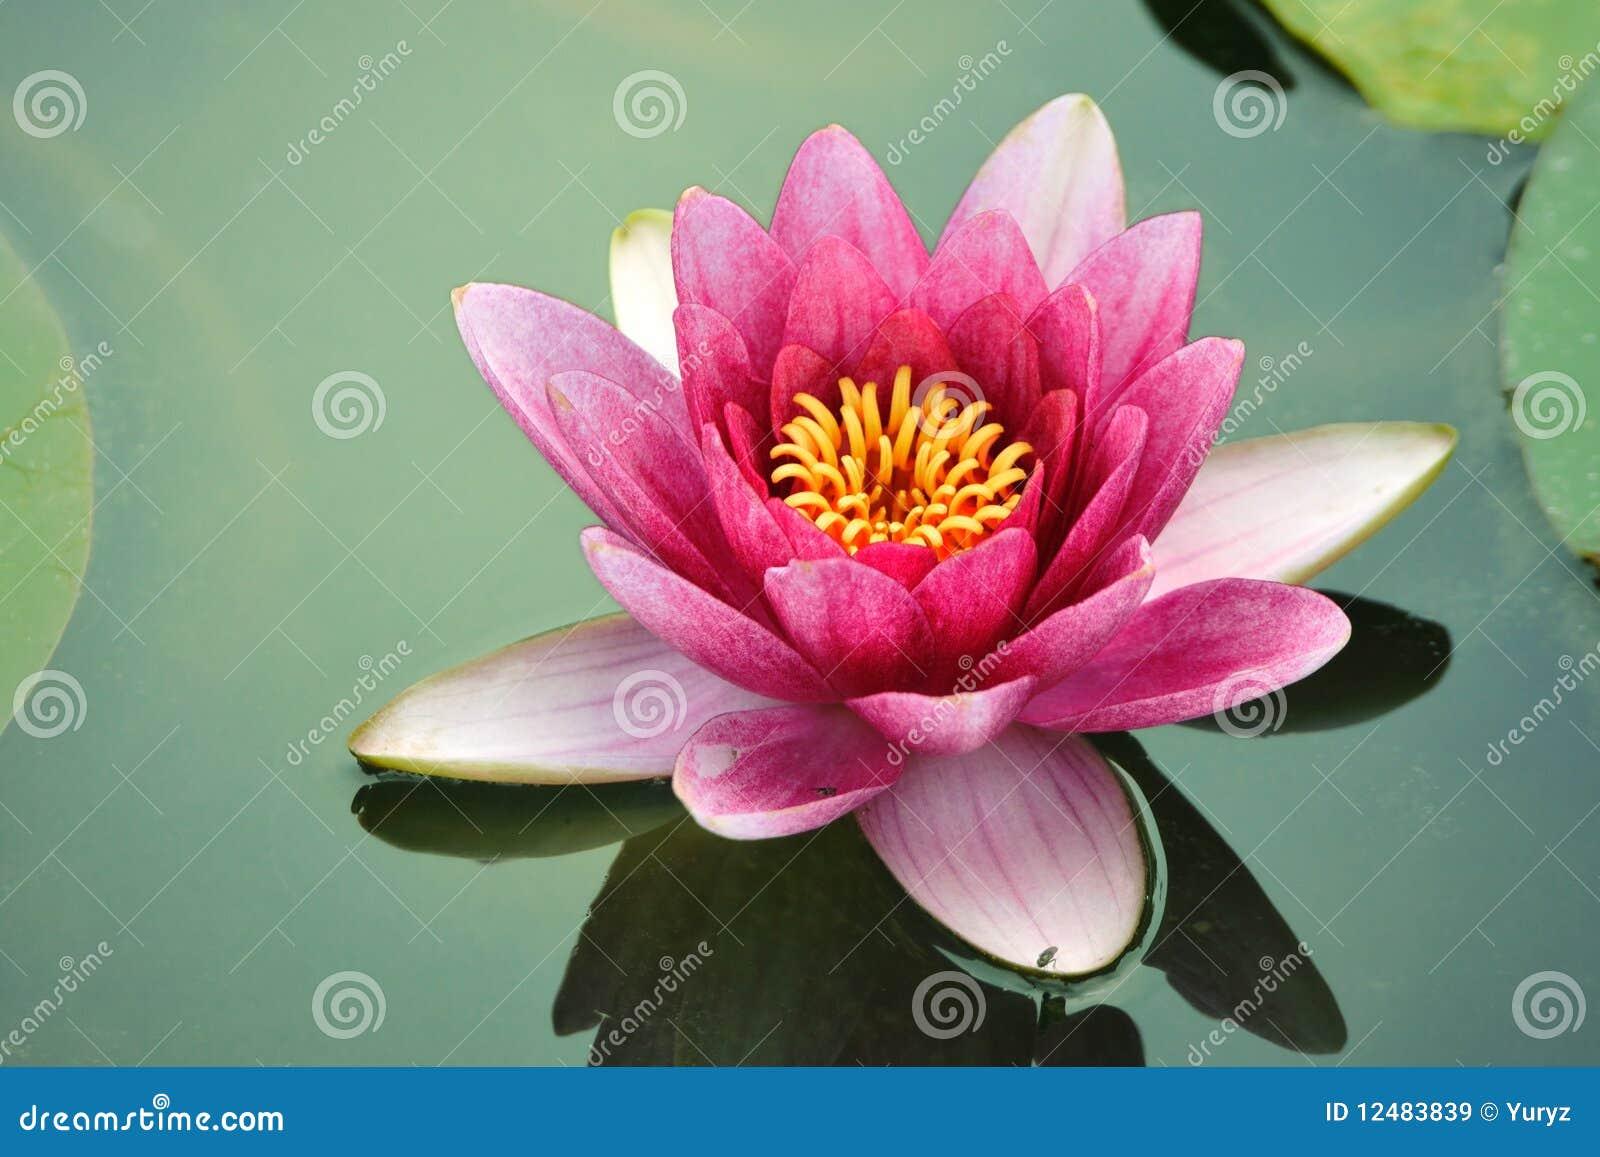 Close up lotus flower stock image image of fresh lake 12483839 close up lotus flower mightylinksfo